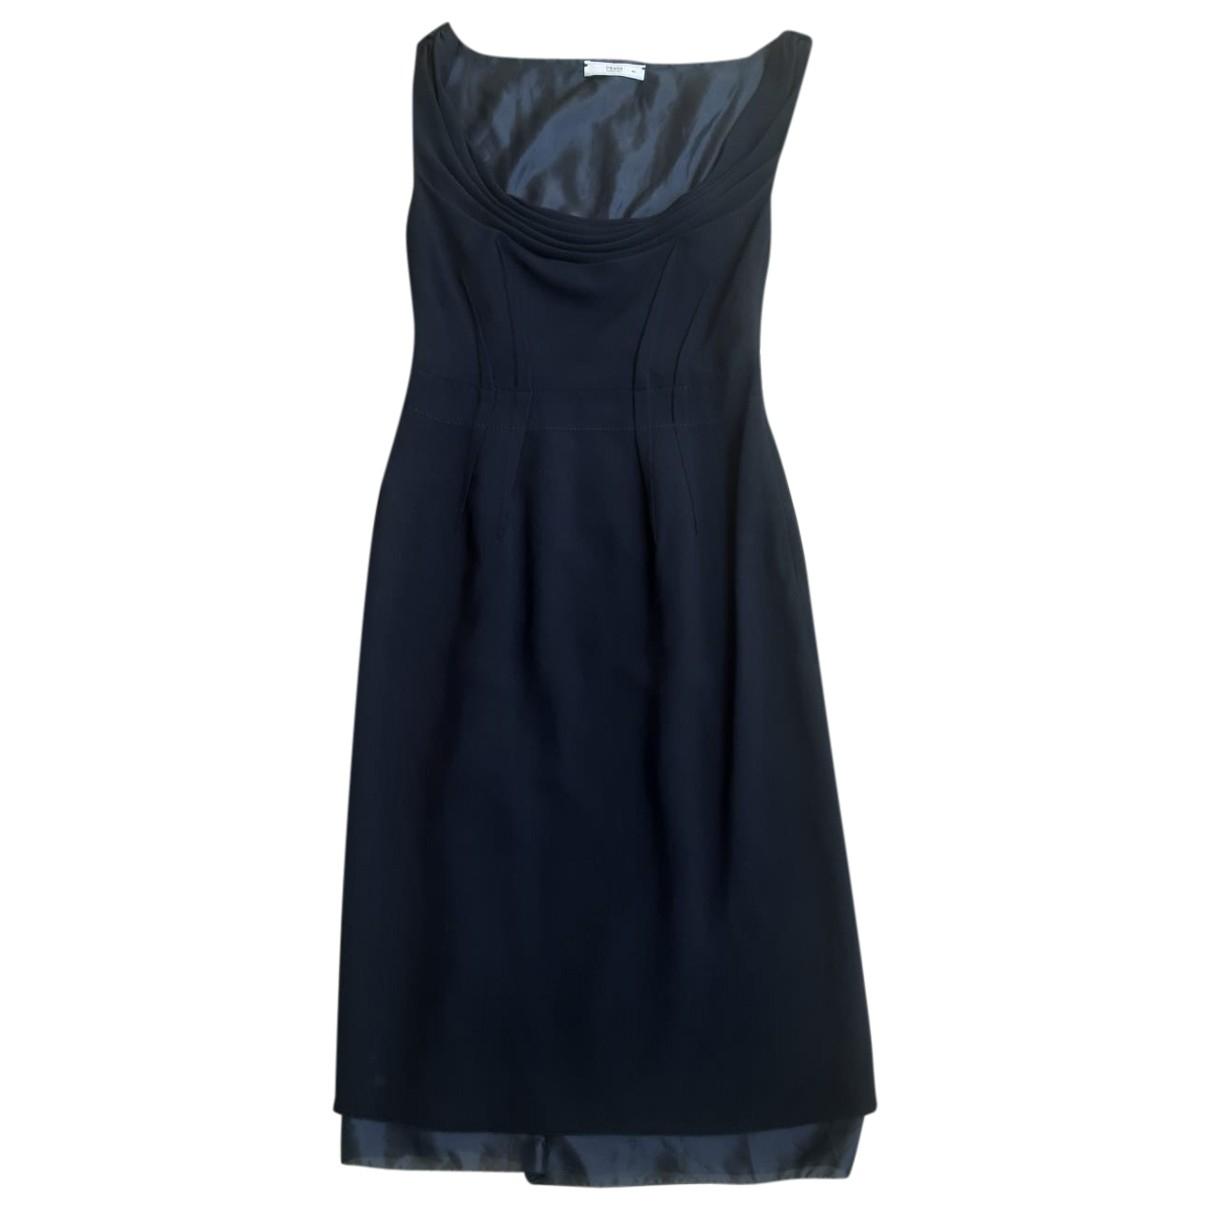 Prada \N Black dress for Women 40 IT